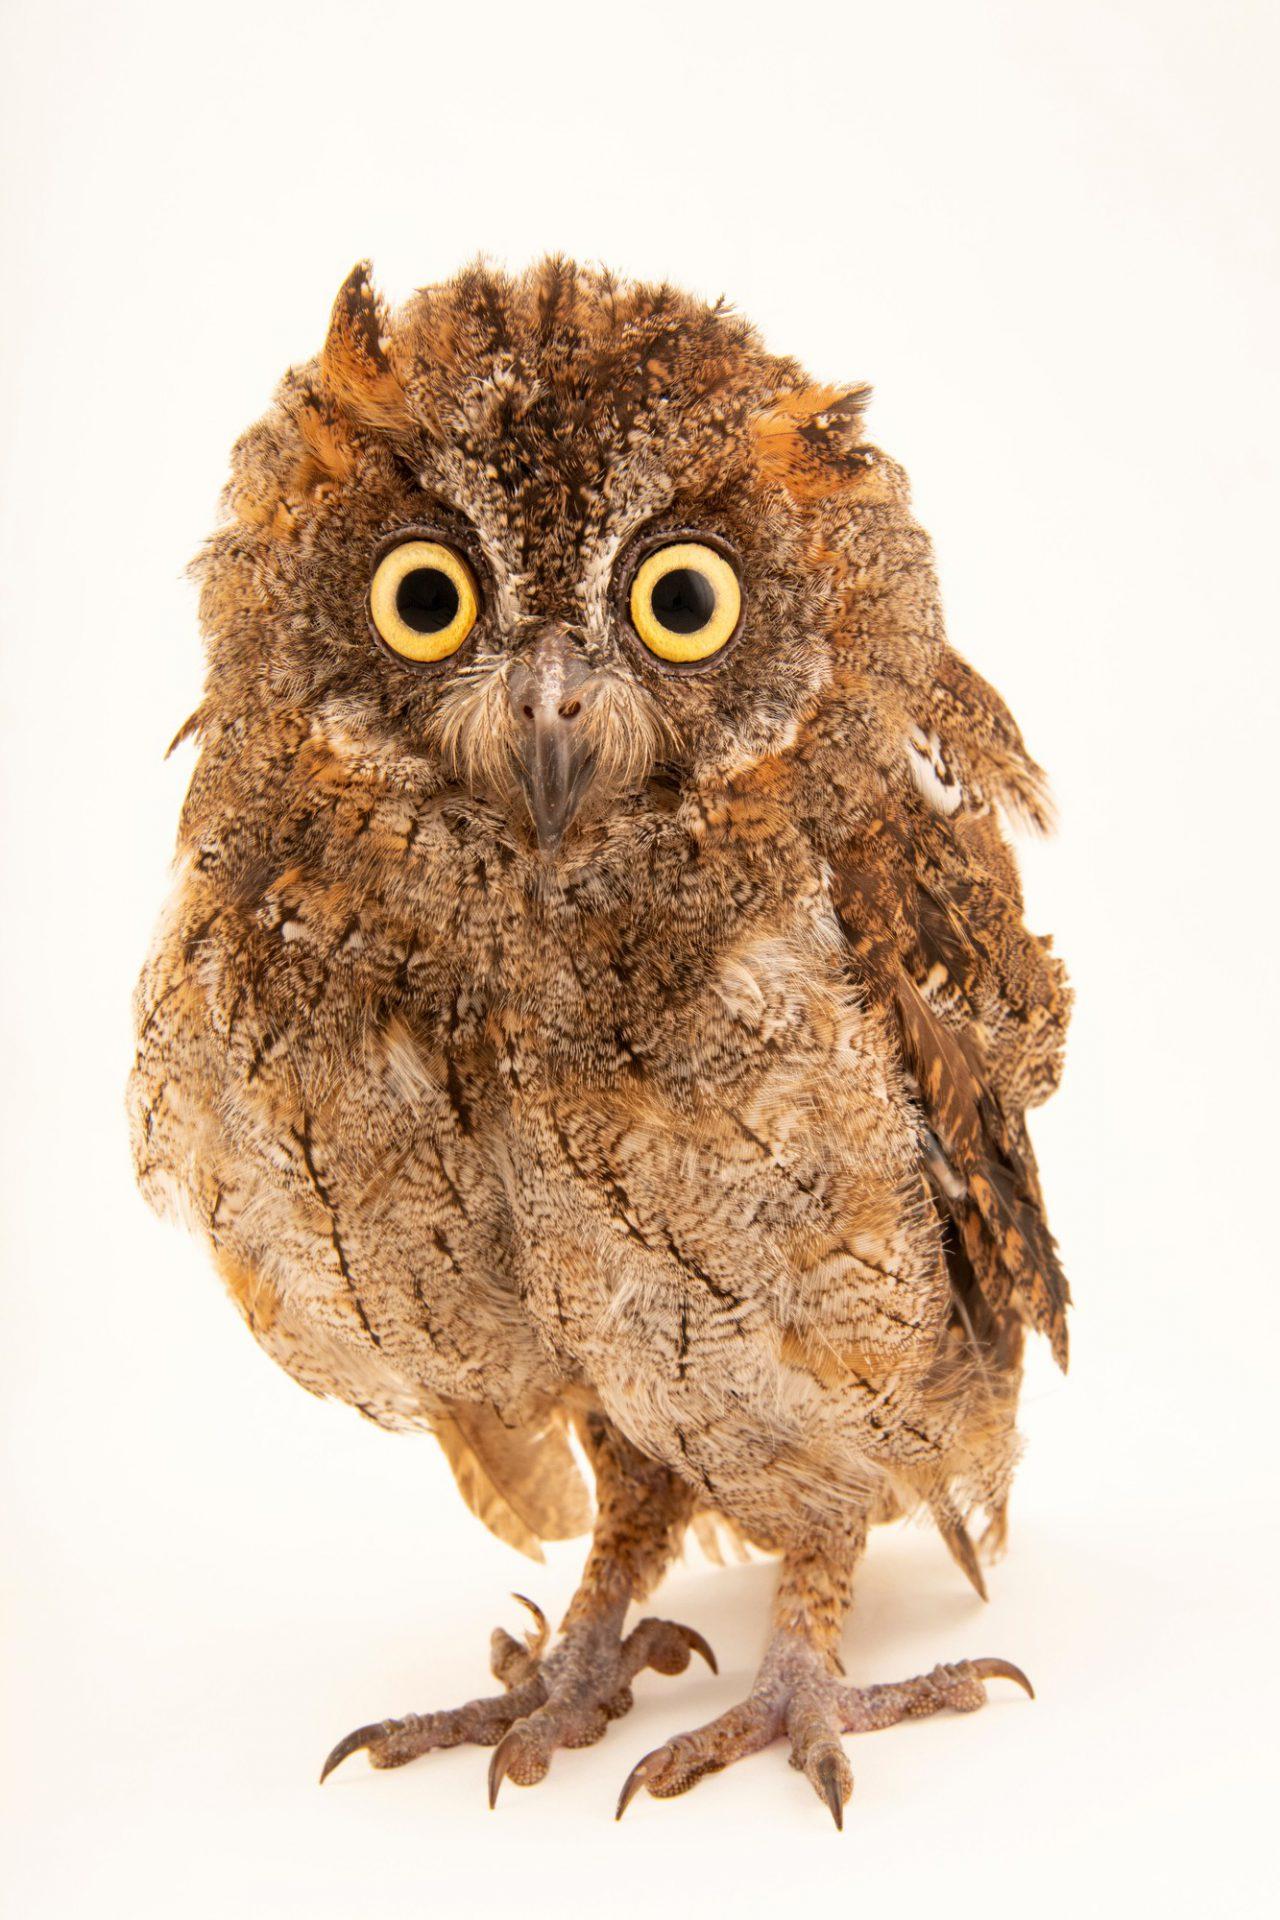 Photo: Mindanao highland scops owl (Otus mirus) at Crocolandia in the Philippines.